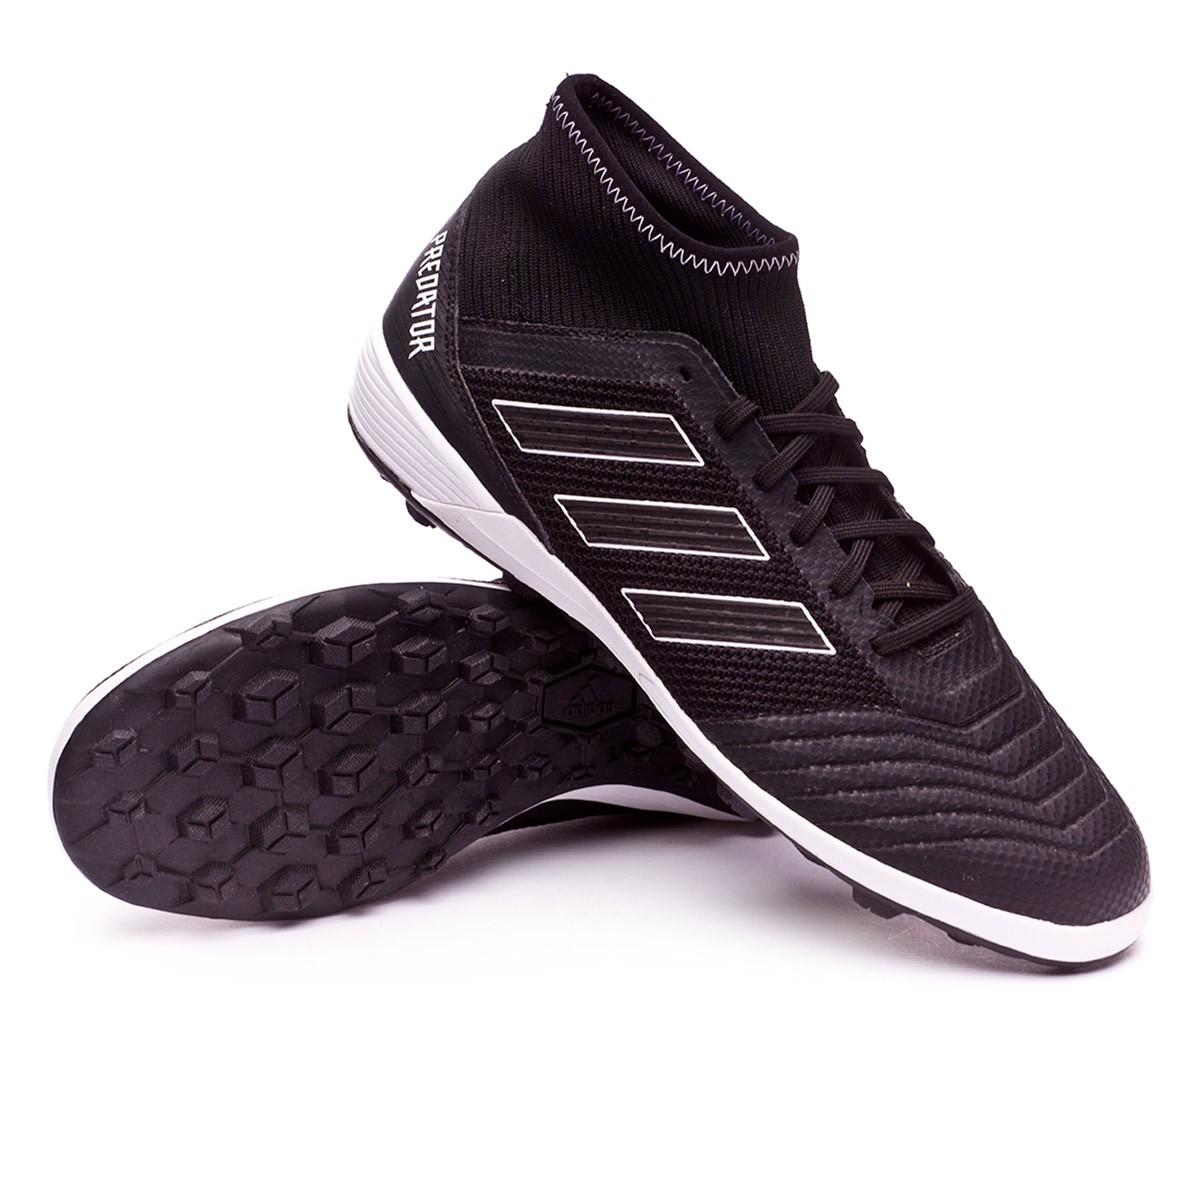 e412c5494 Football Boot adidas Predator Tango 18.3 Turf Core black-White - Football  store Fútbol Emotion